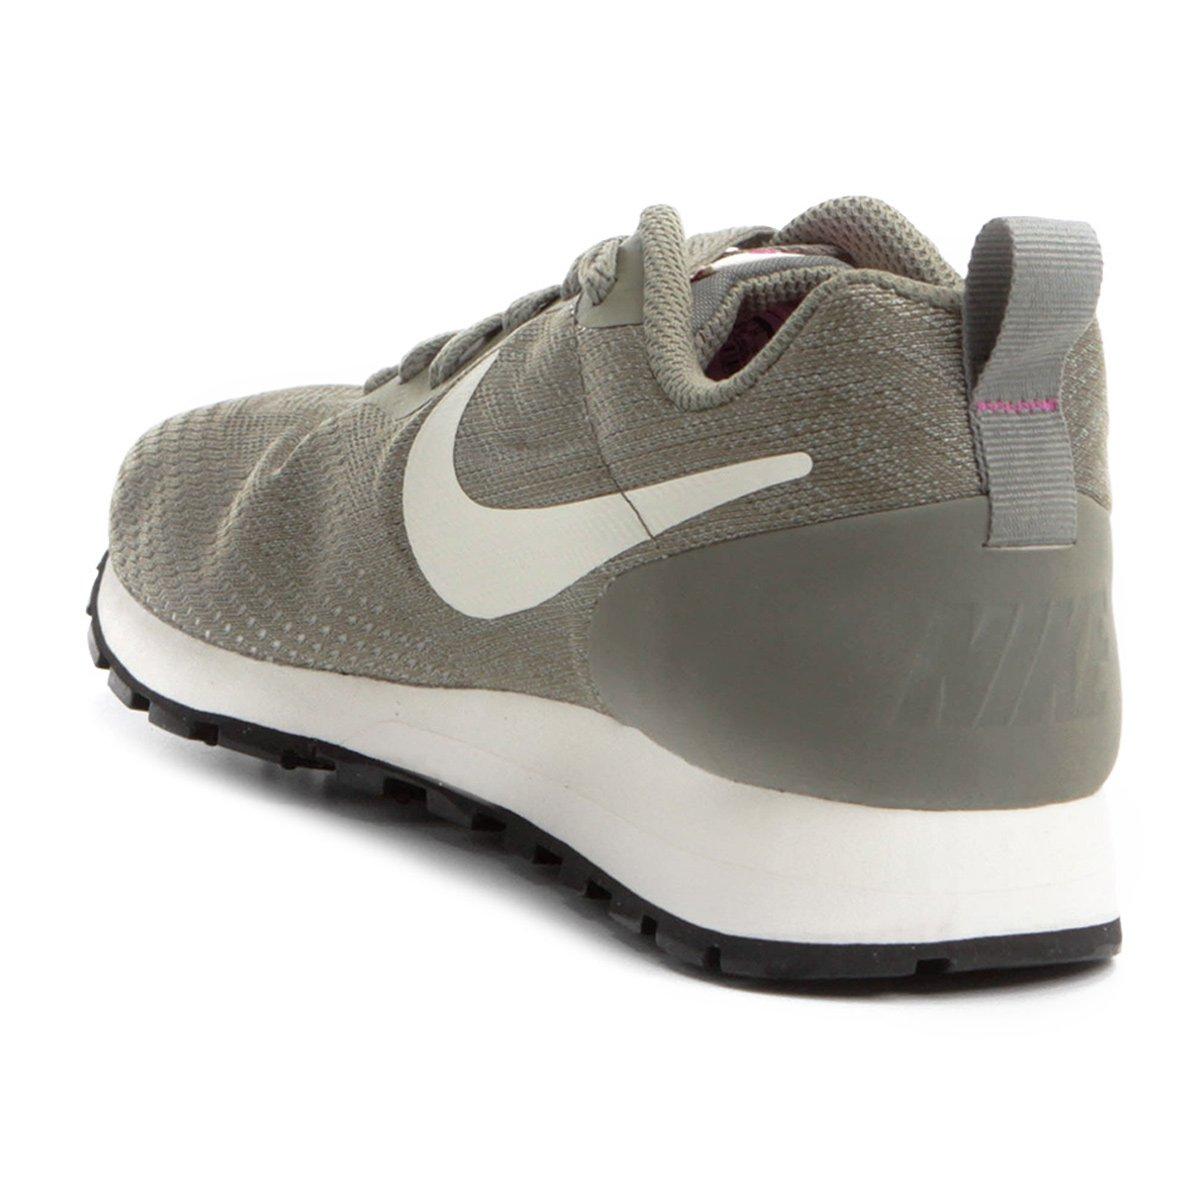 55c267b9d2 Tênis Nike Md Runner 2 Eng Mesh Feminino - Verde e Branco - Compre ...